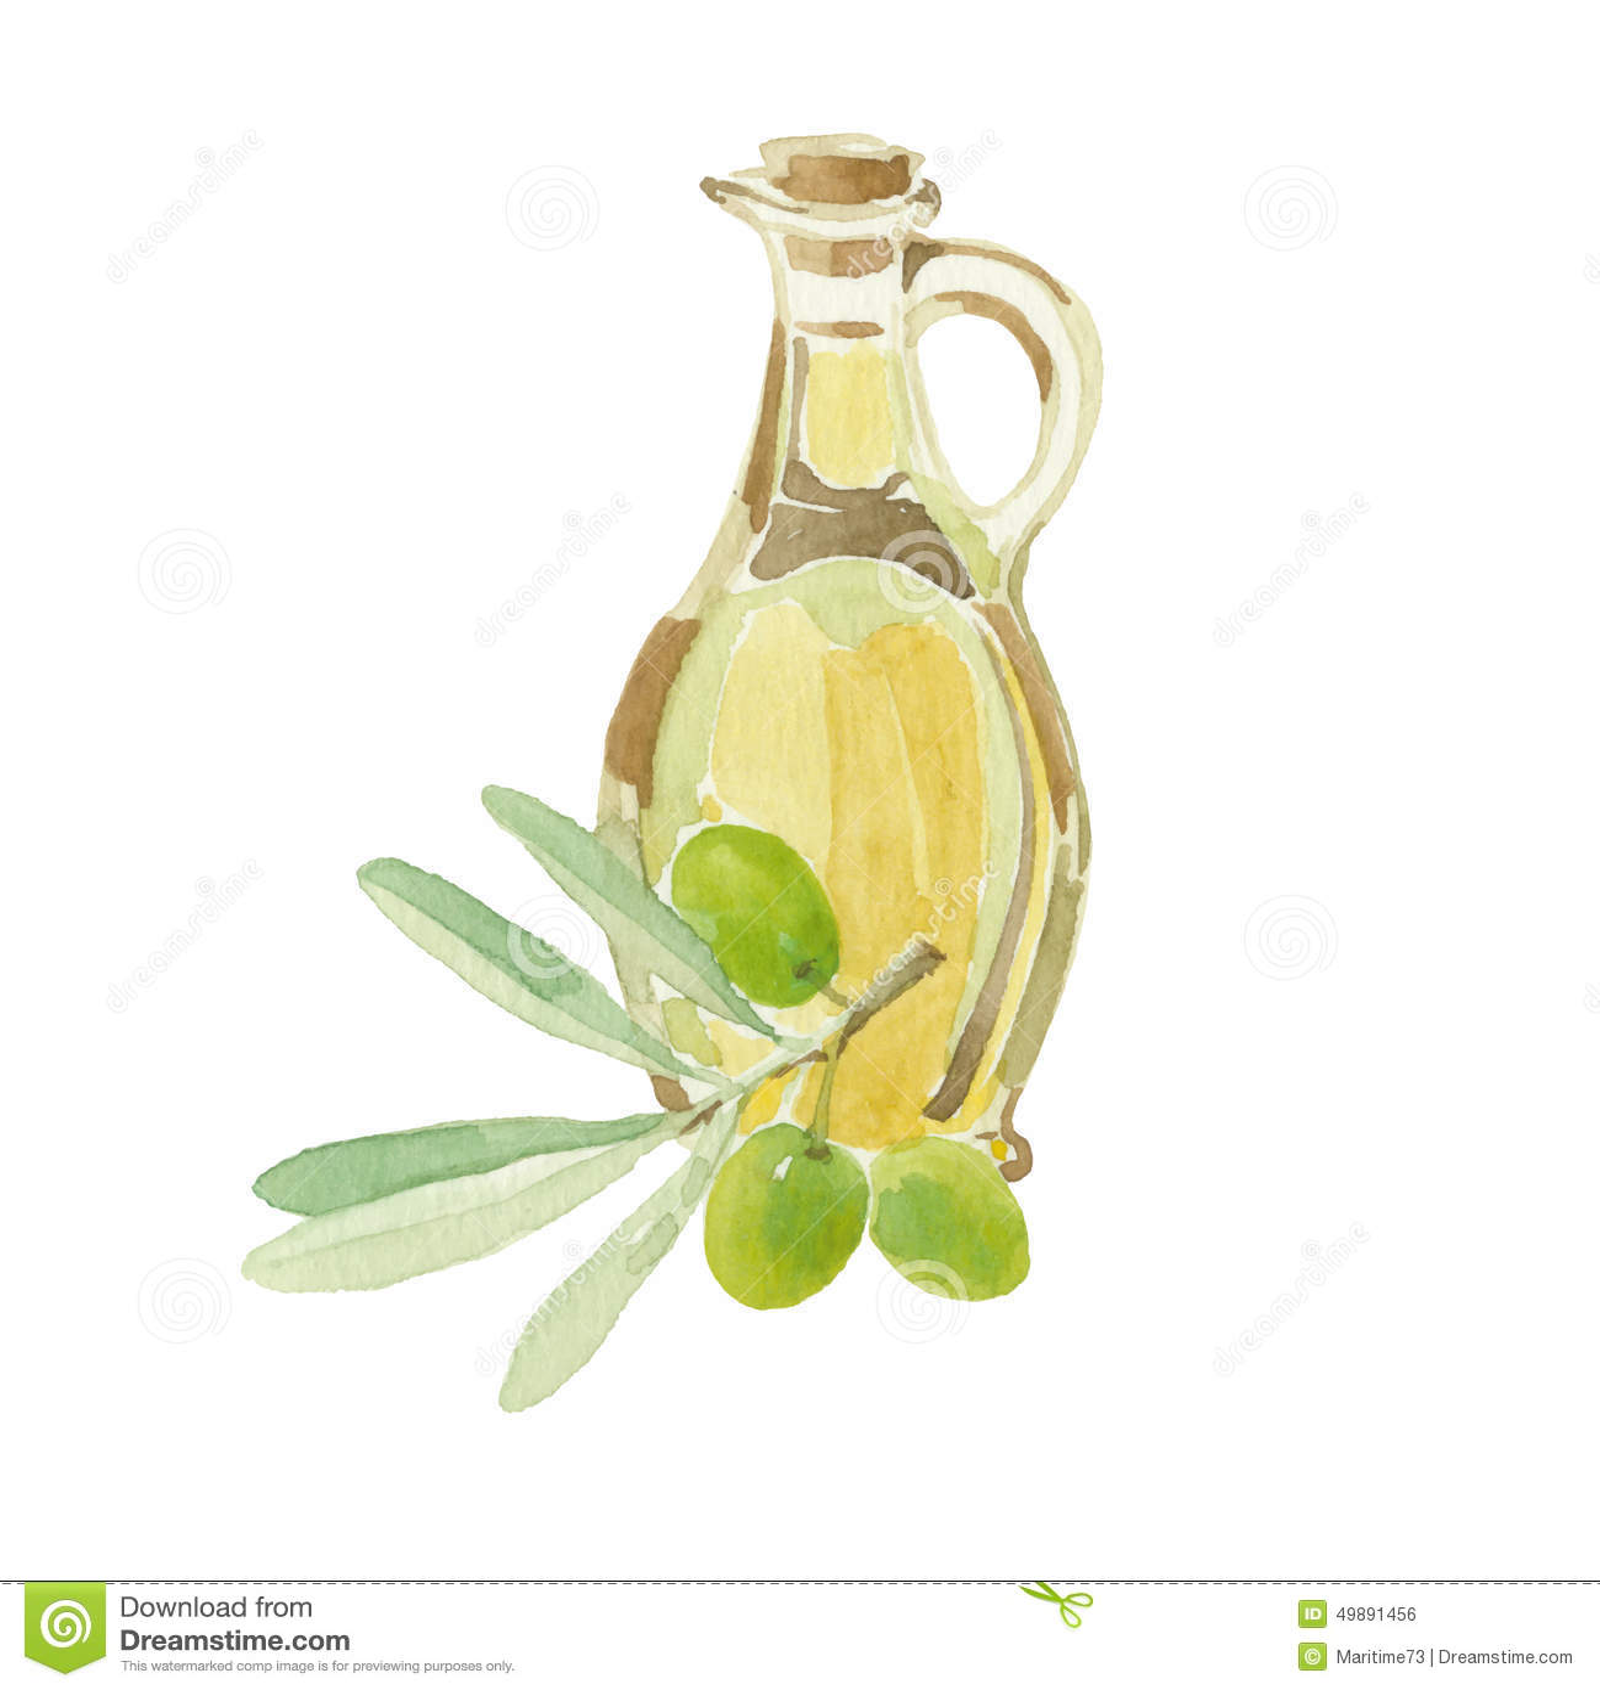 branche d 39 olivier et une bouteille du dessin d 39 huile d. Black Bedroom Furniture Sets. Home Design Ideas